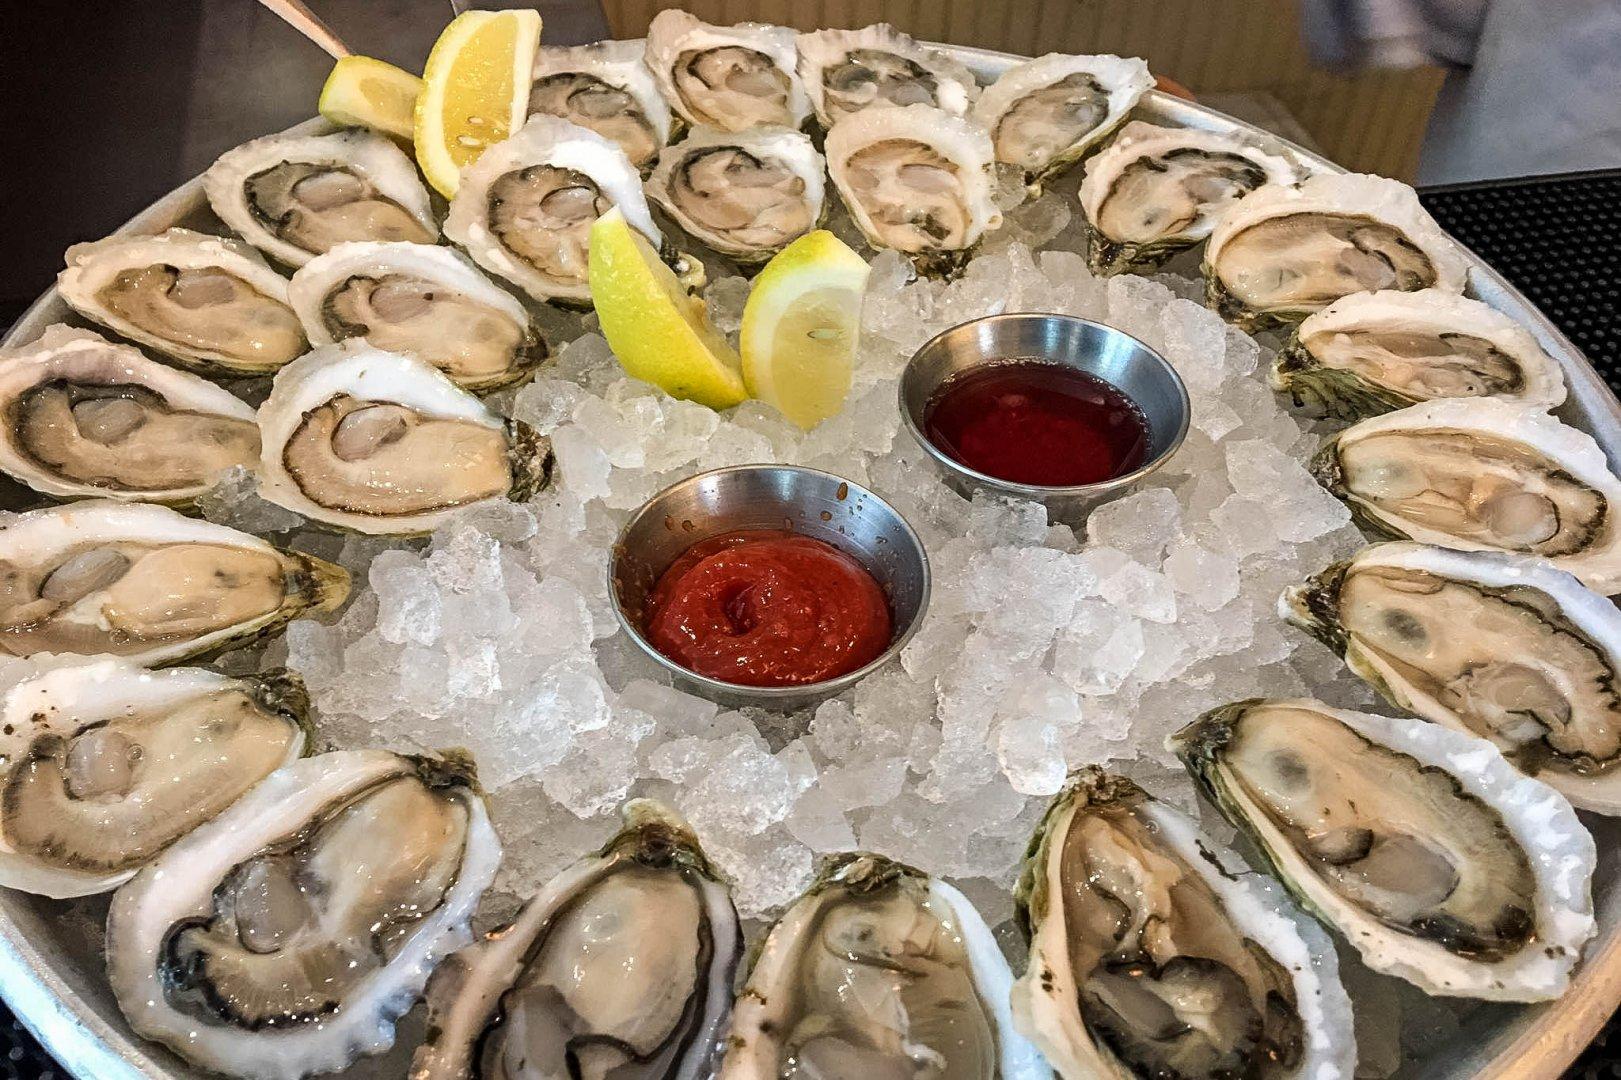 25 Tl oysters_web_size.jpg